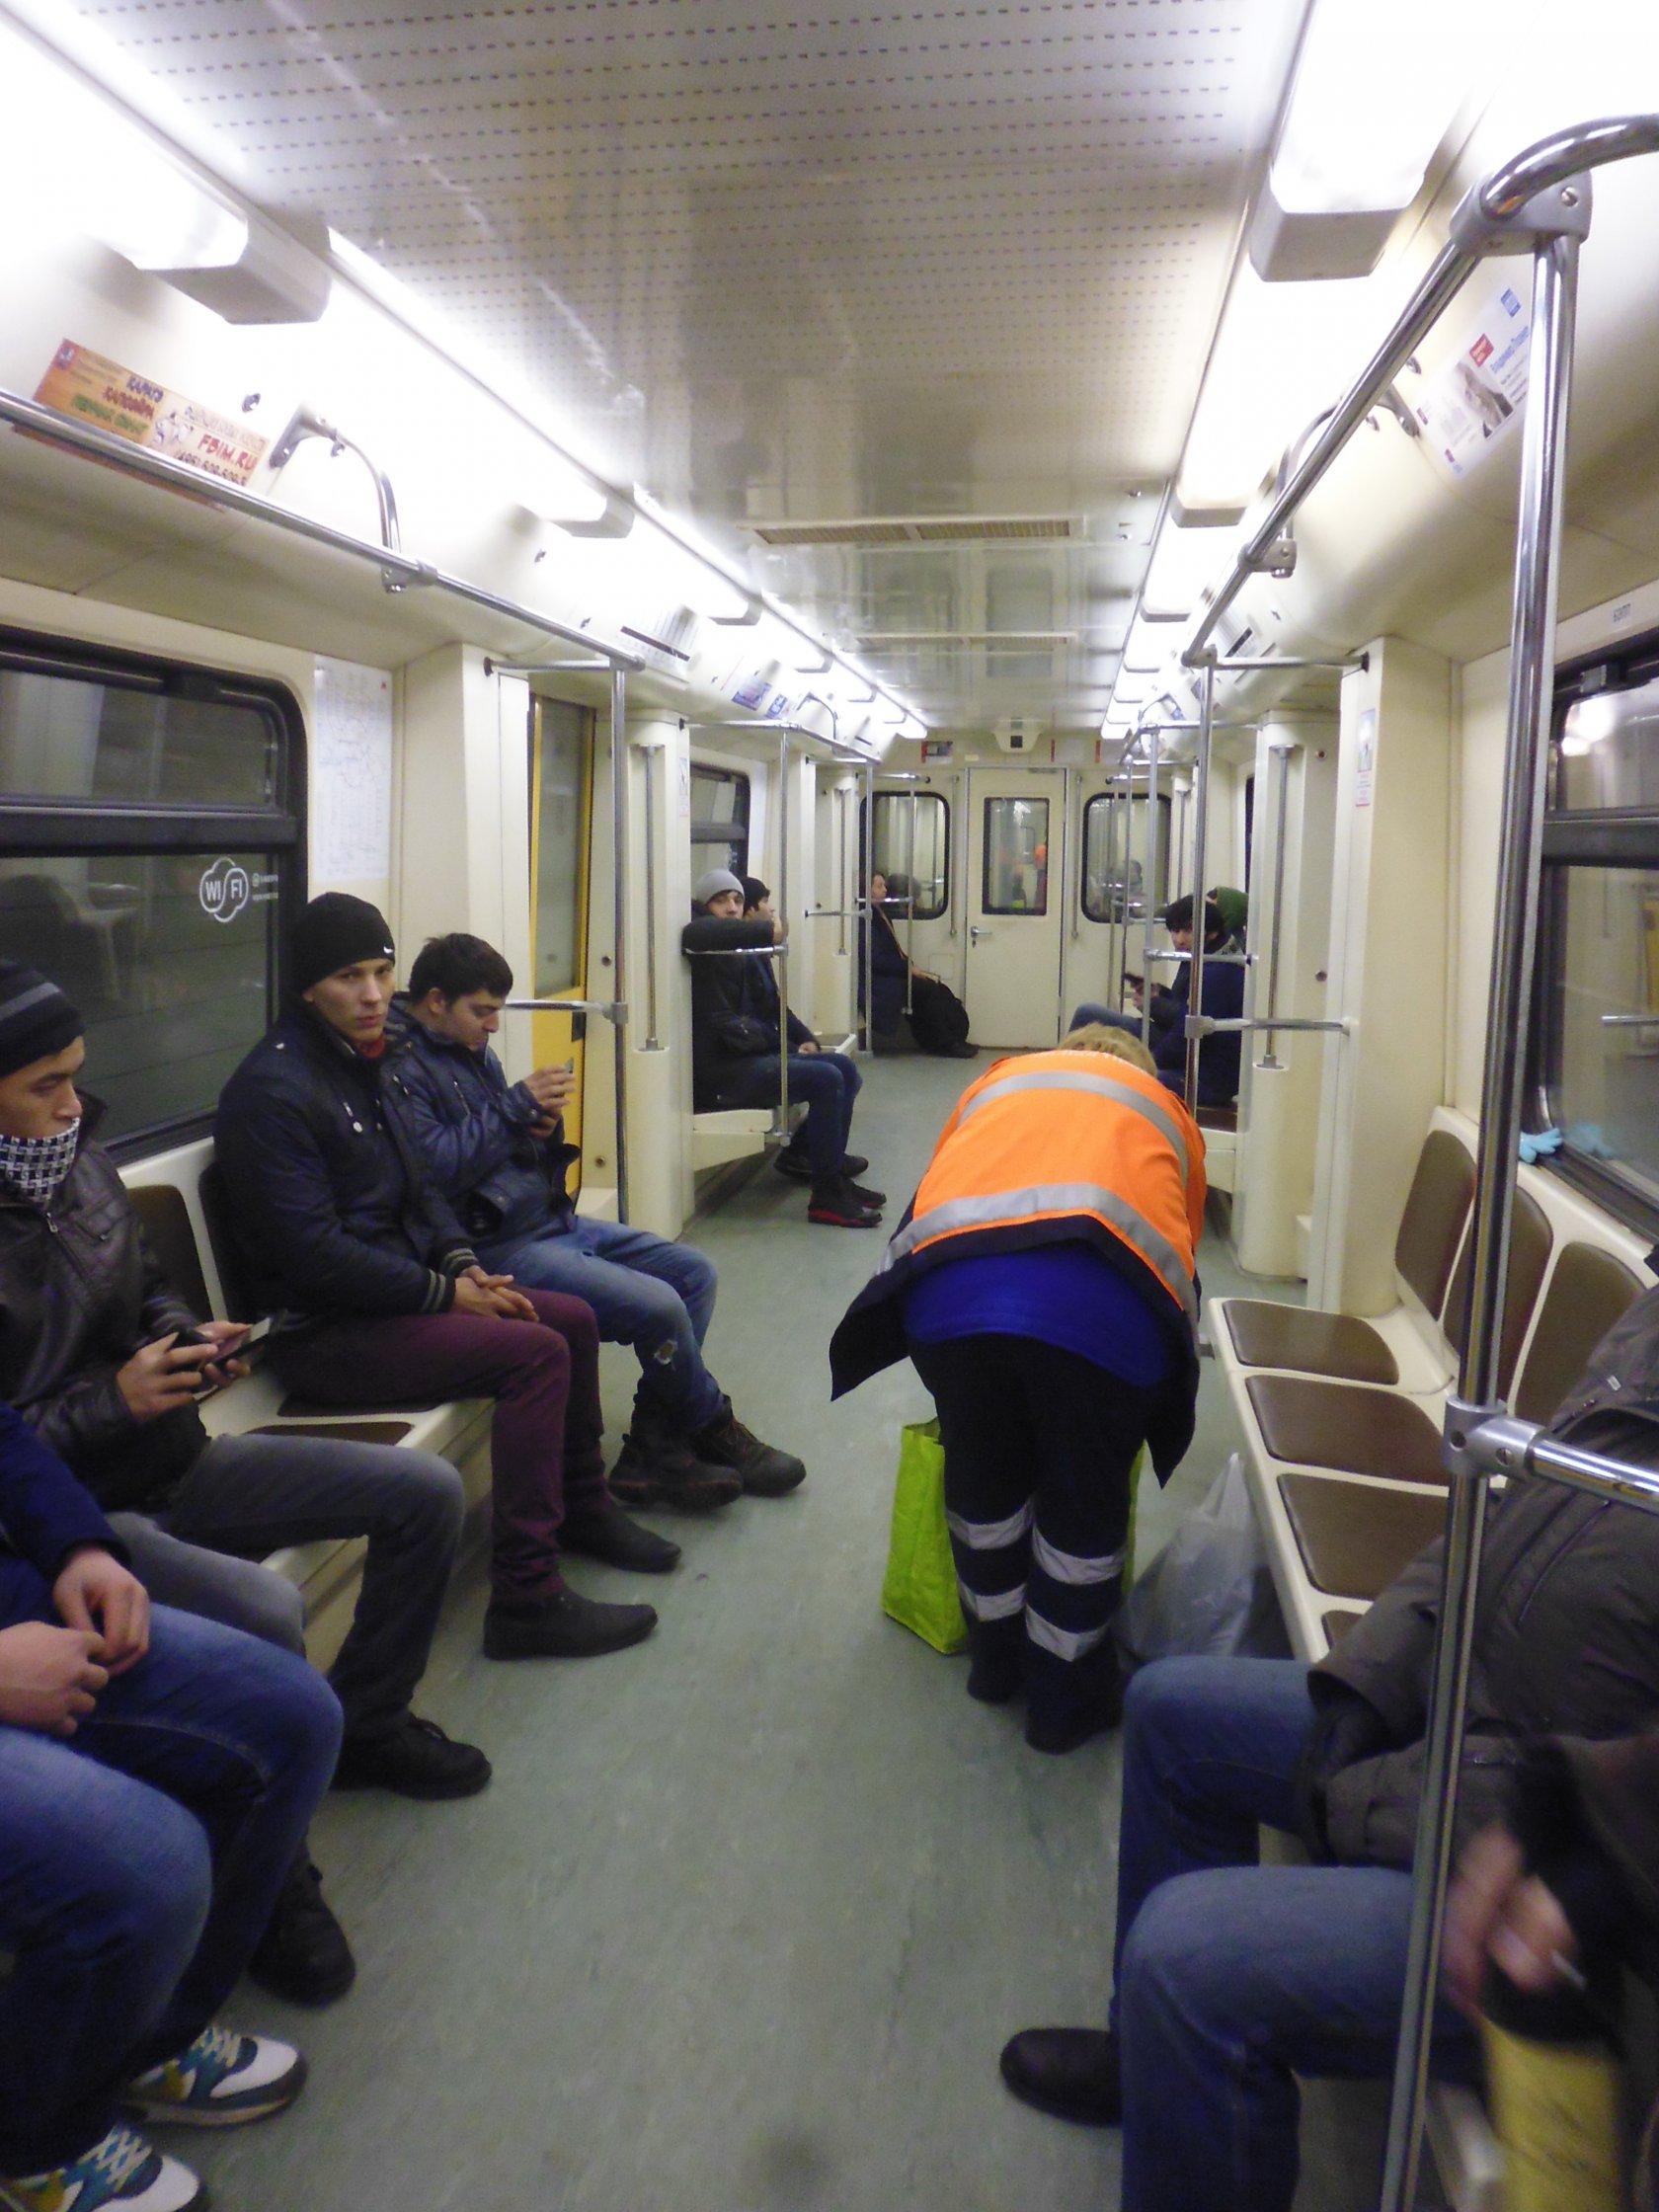 Страпонами, девушку гладят в метро